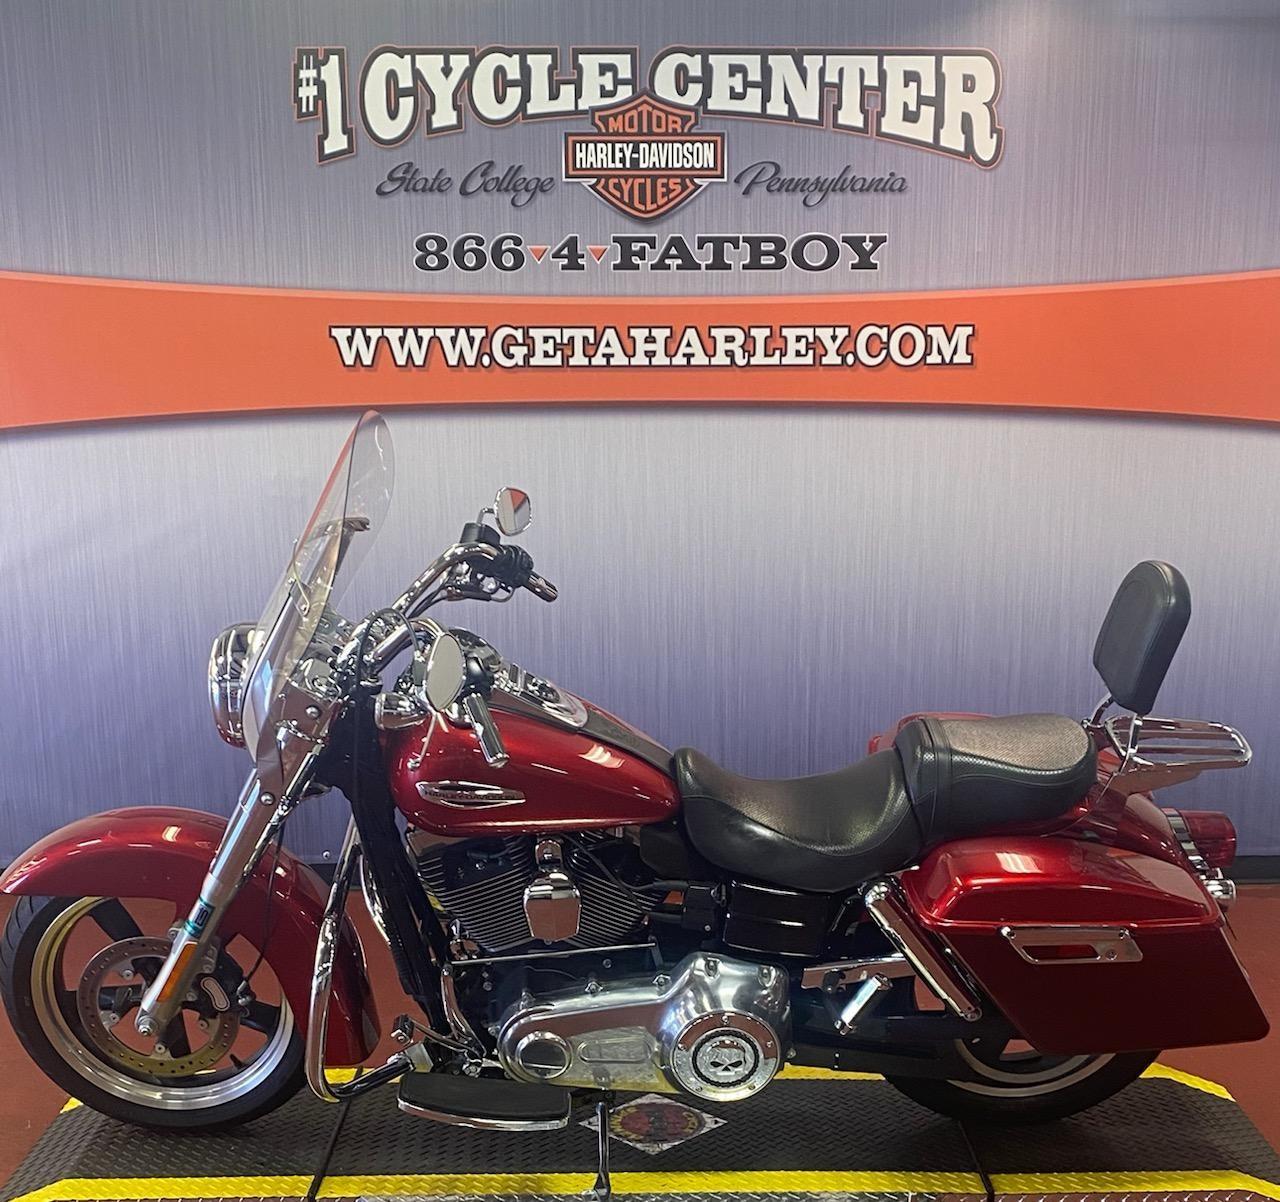 2012 Harley-Davidson Dyna  Switch-back FLD-103 Switchback at #1 Cycle Center Harley-Davidson